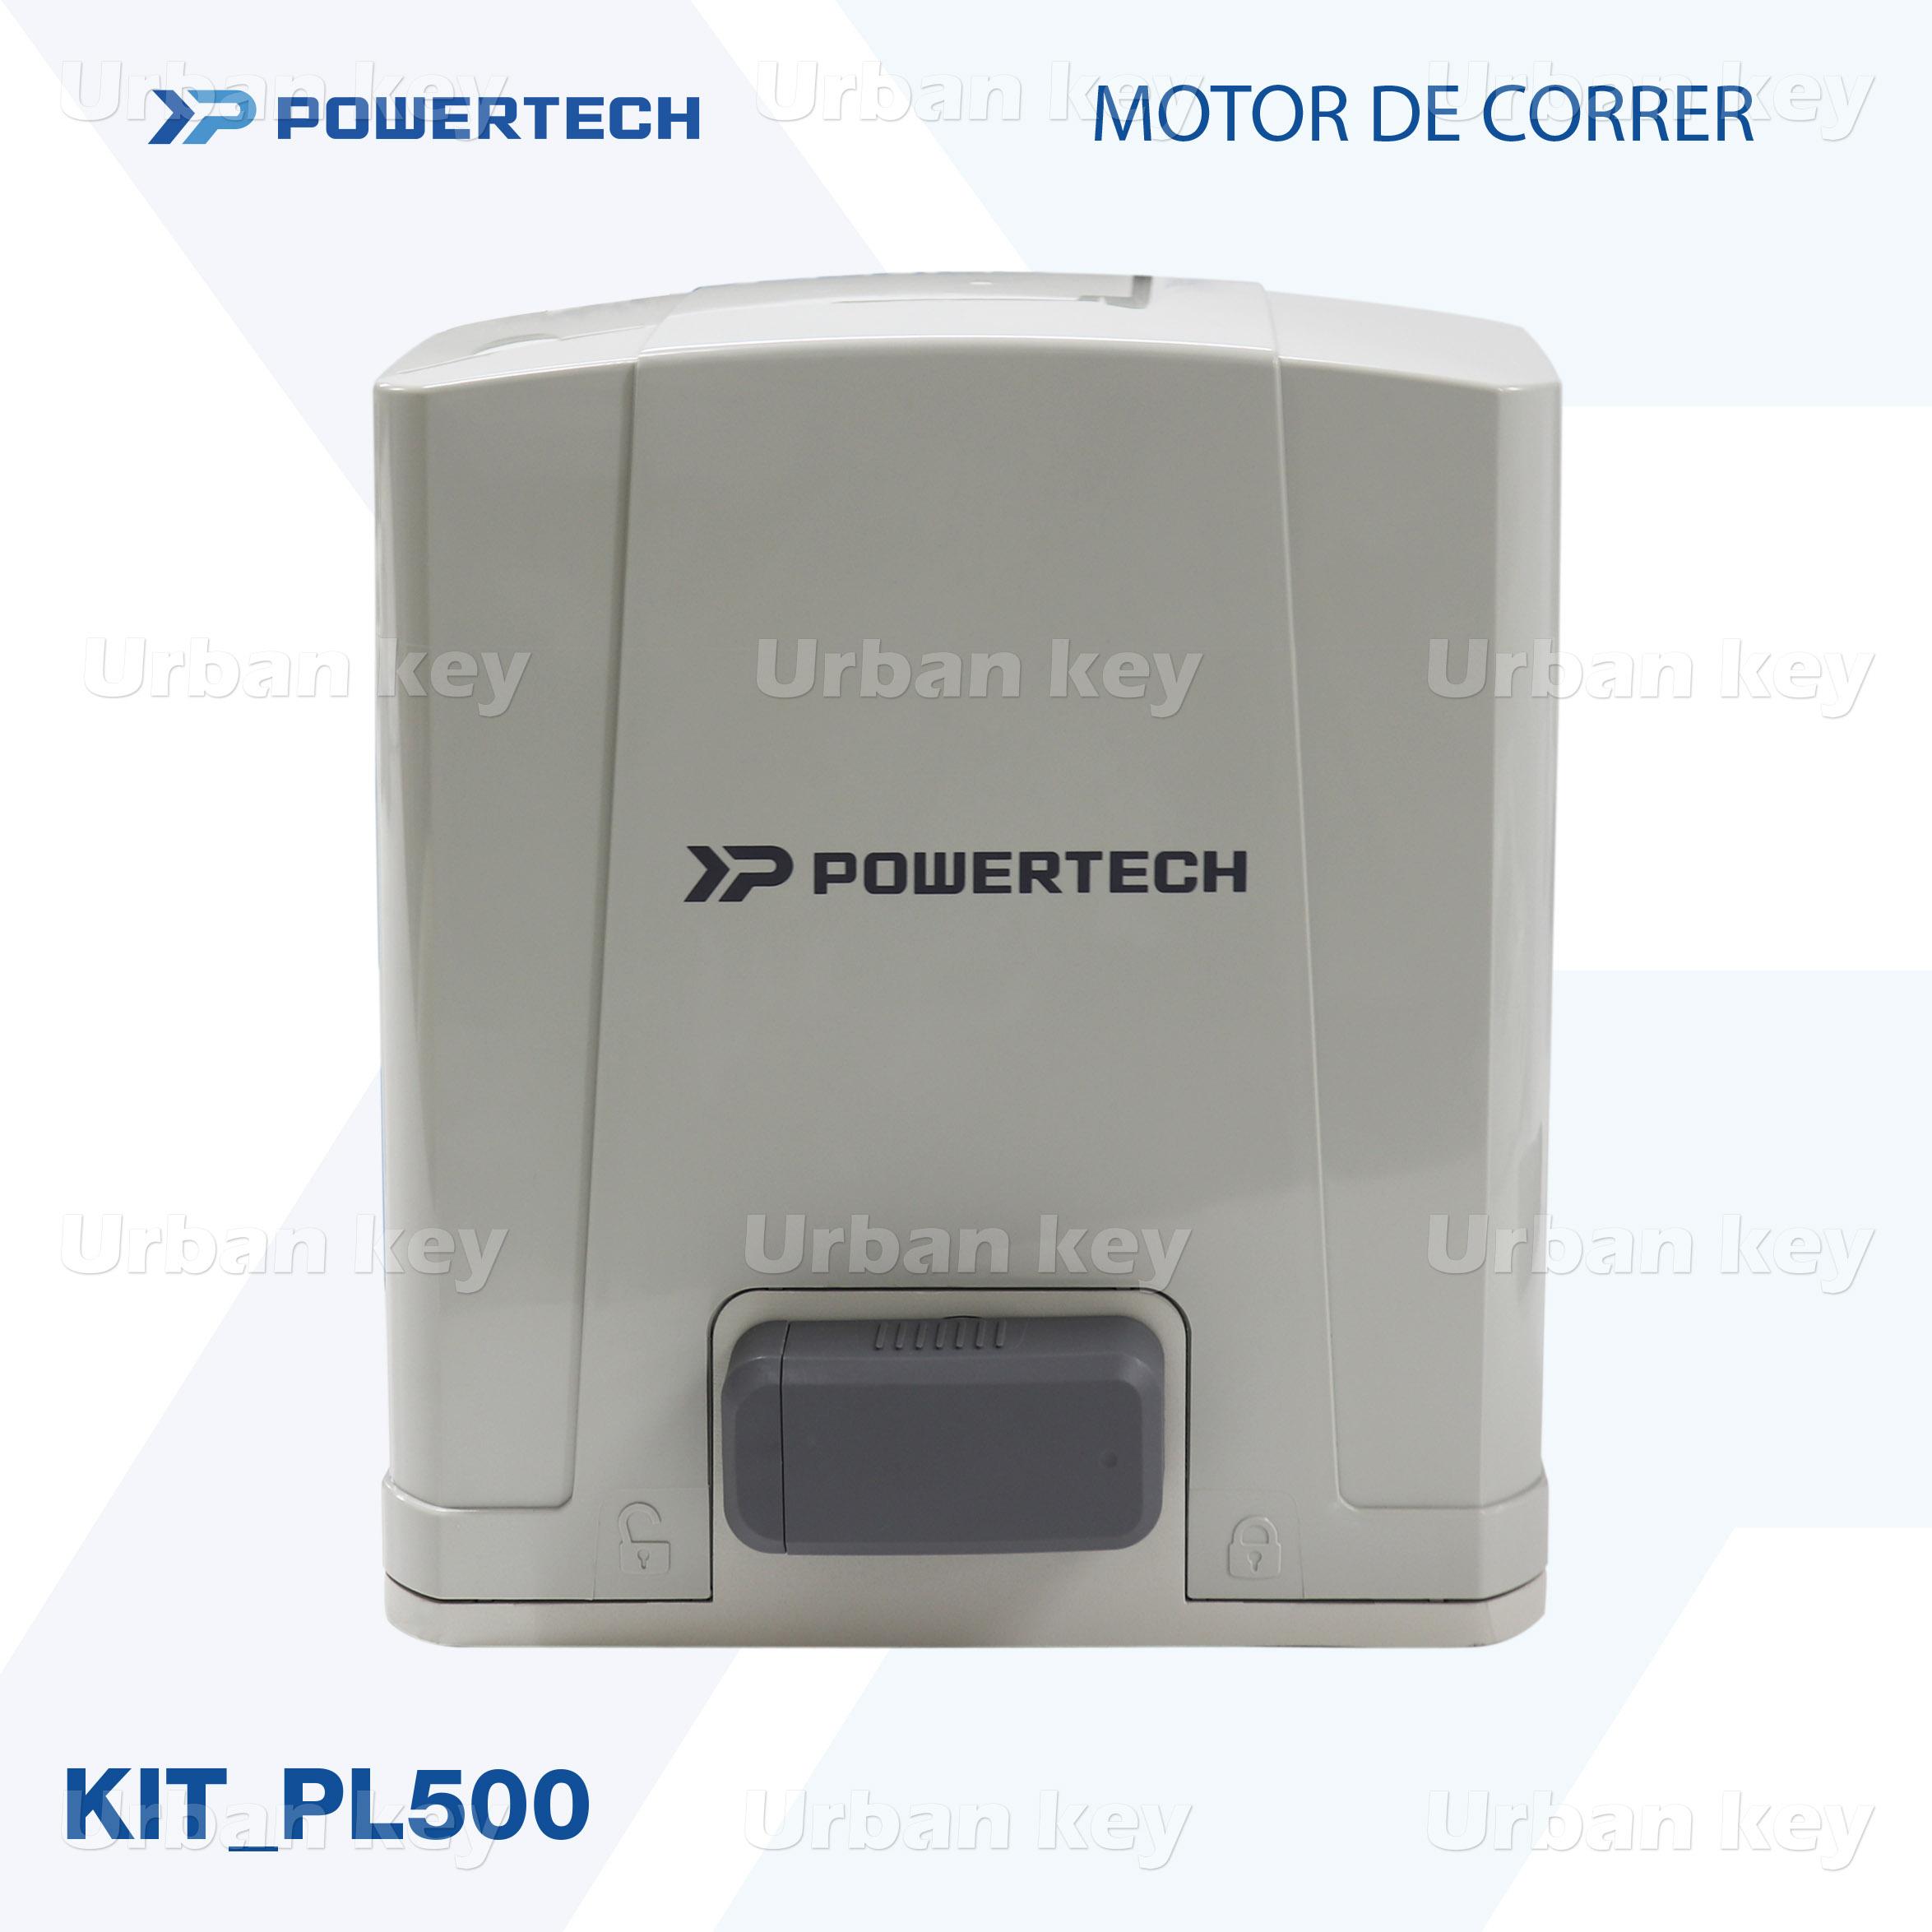 KIT MOTOR DE CORRER  PL500_DC POWERTECH